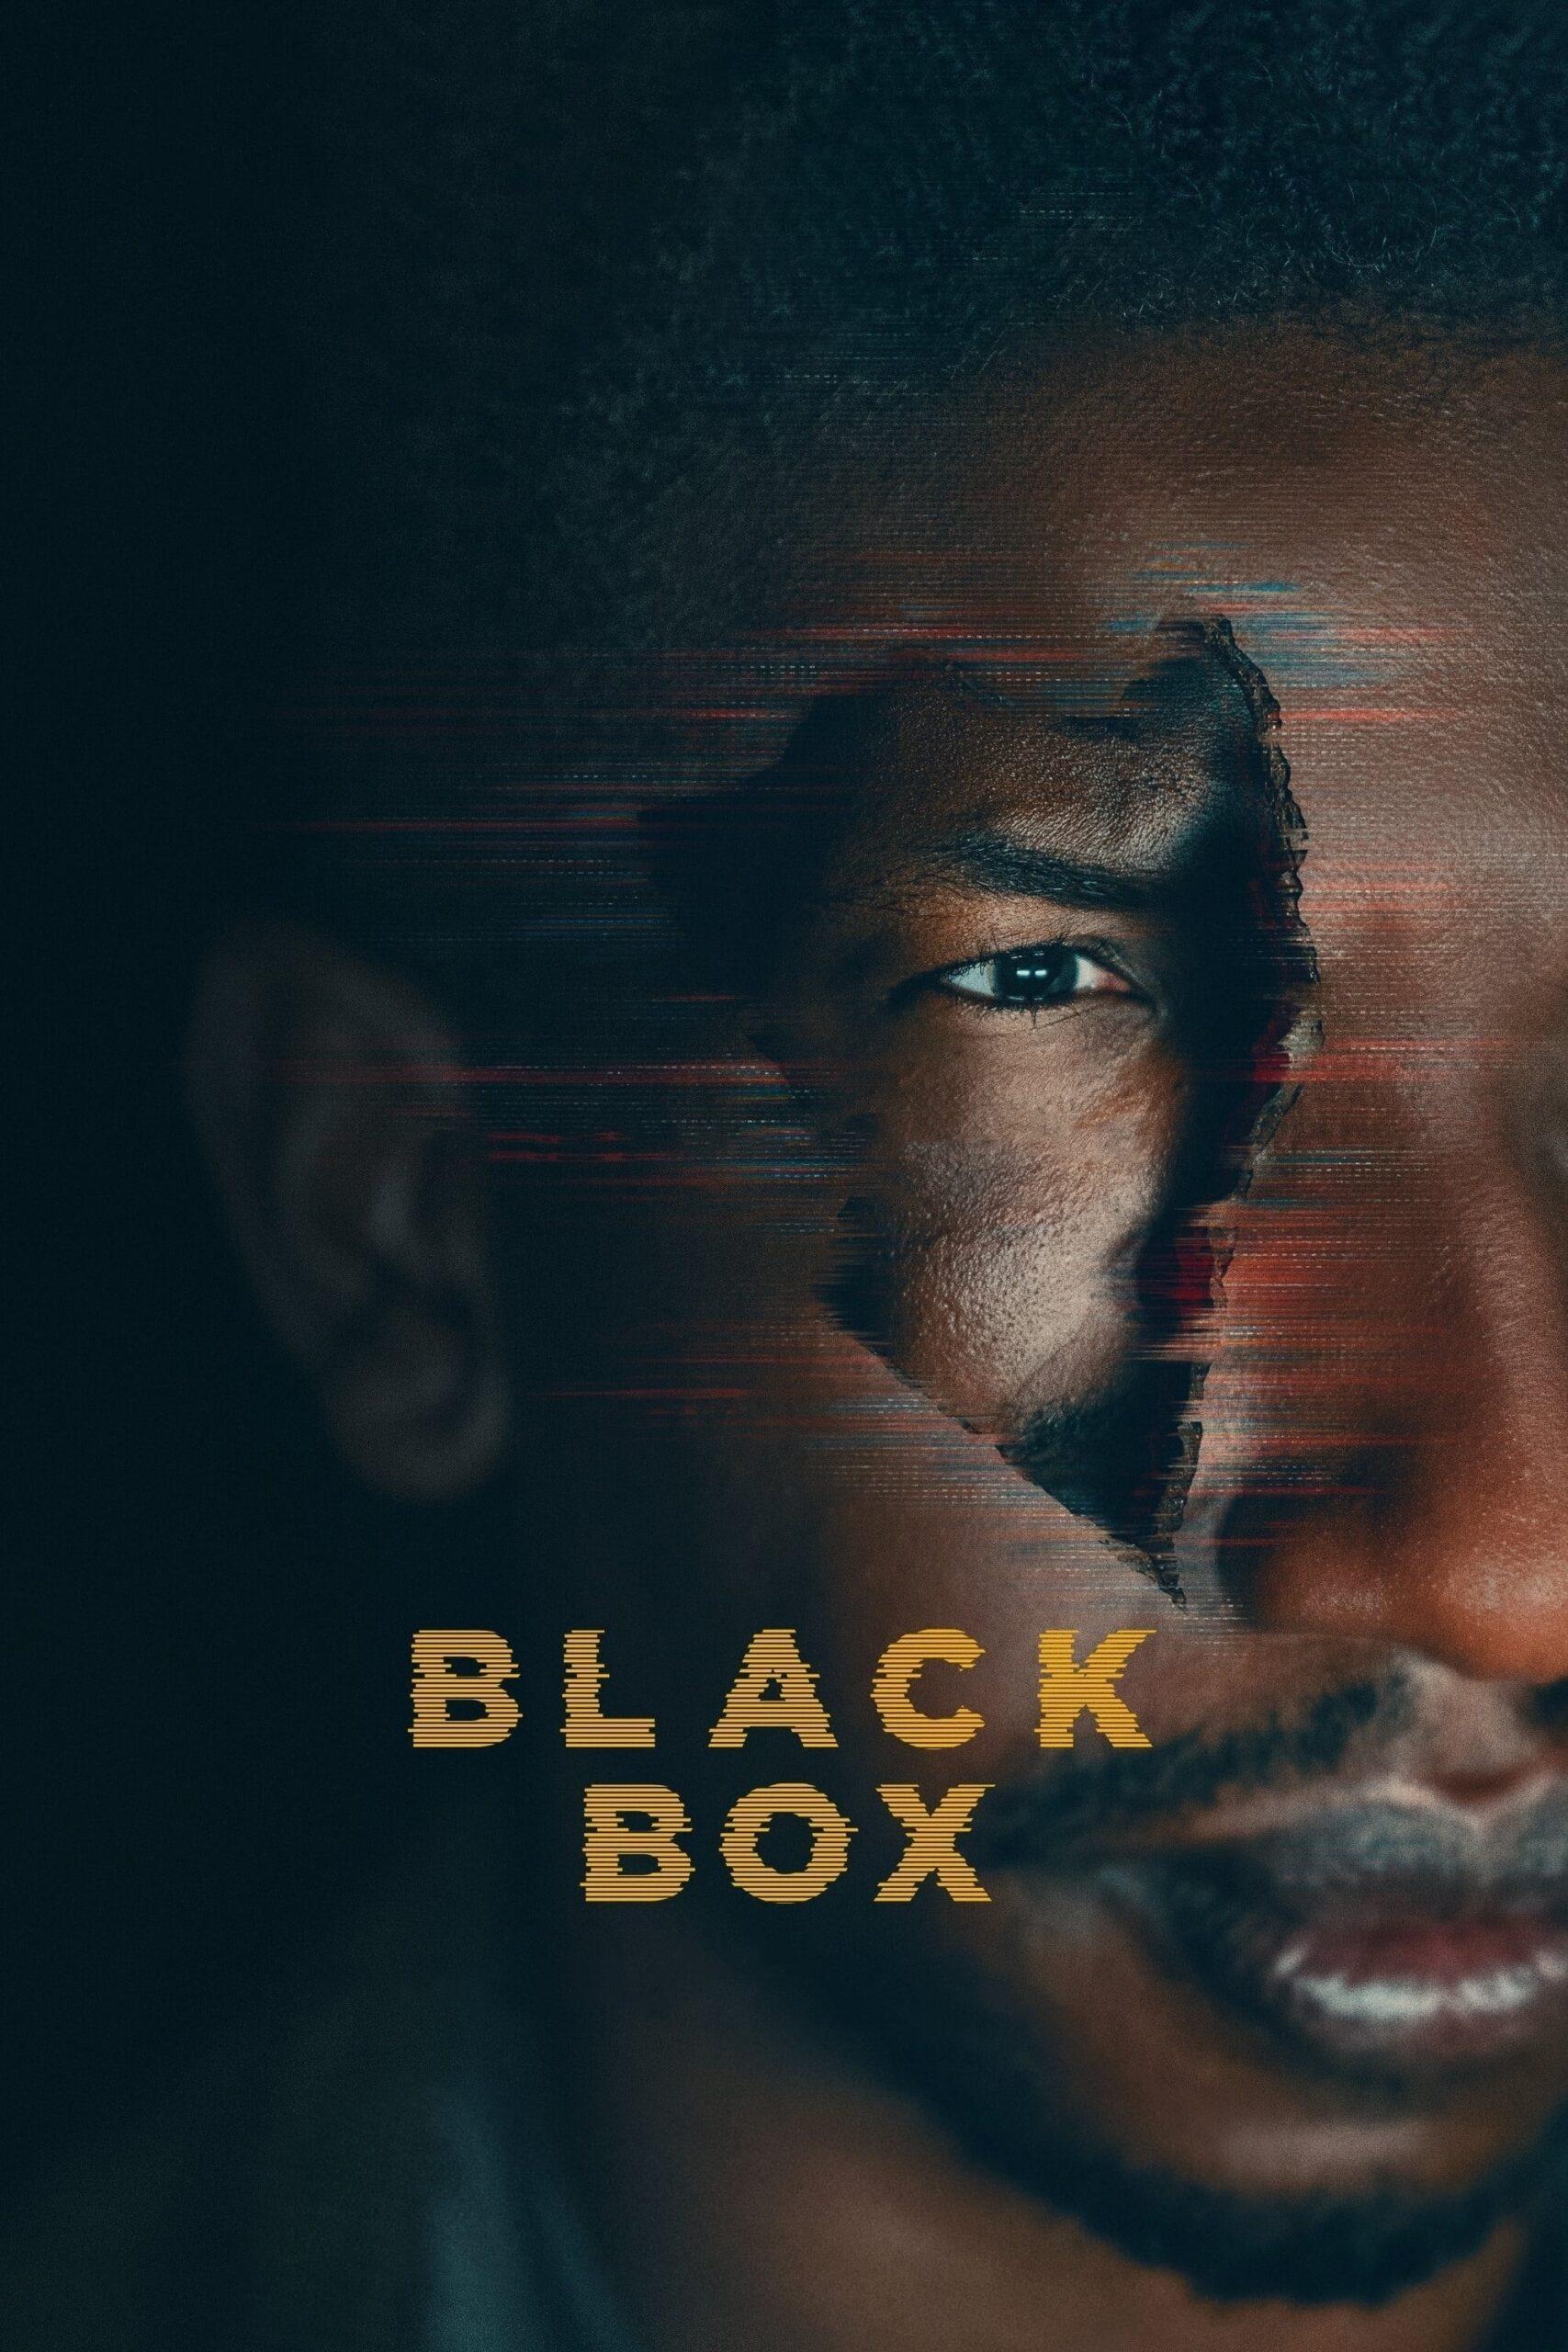 Black Box Movie Streaming Online Watch on Amazon